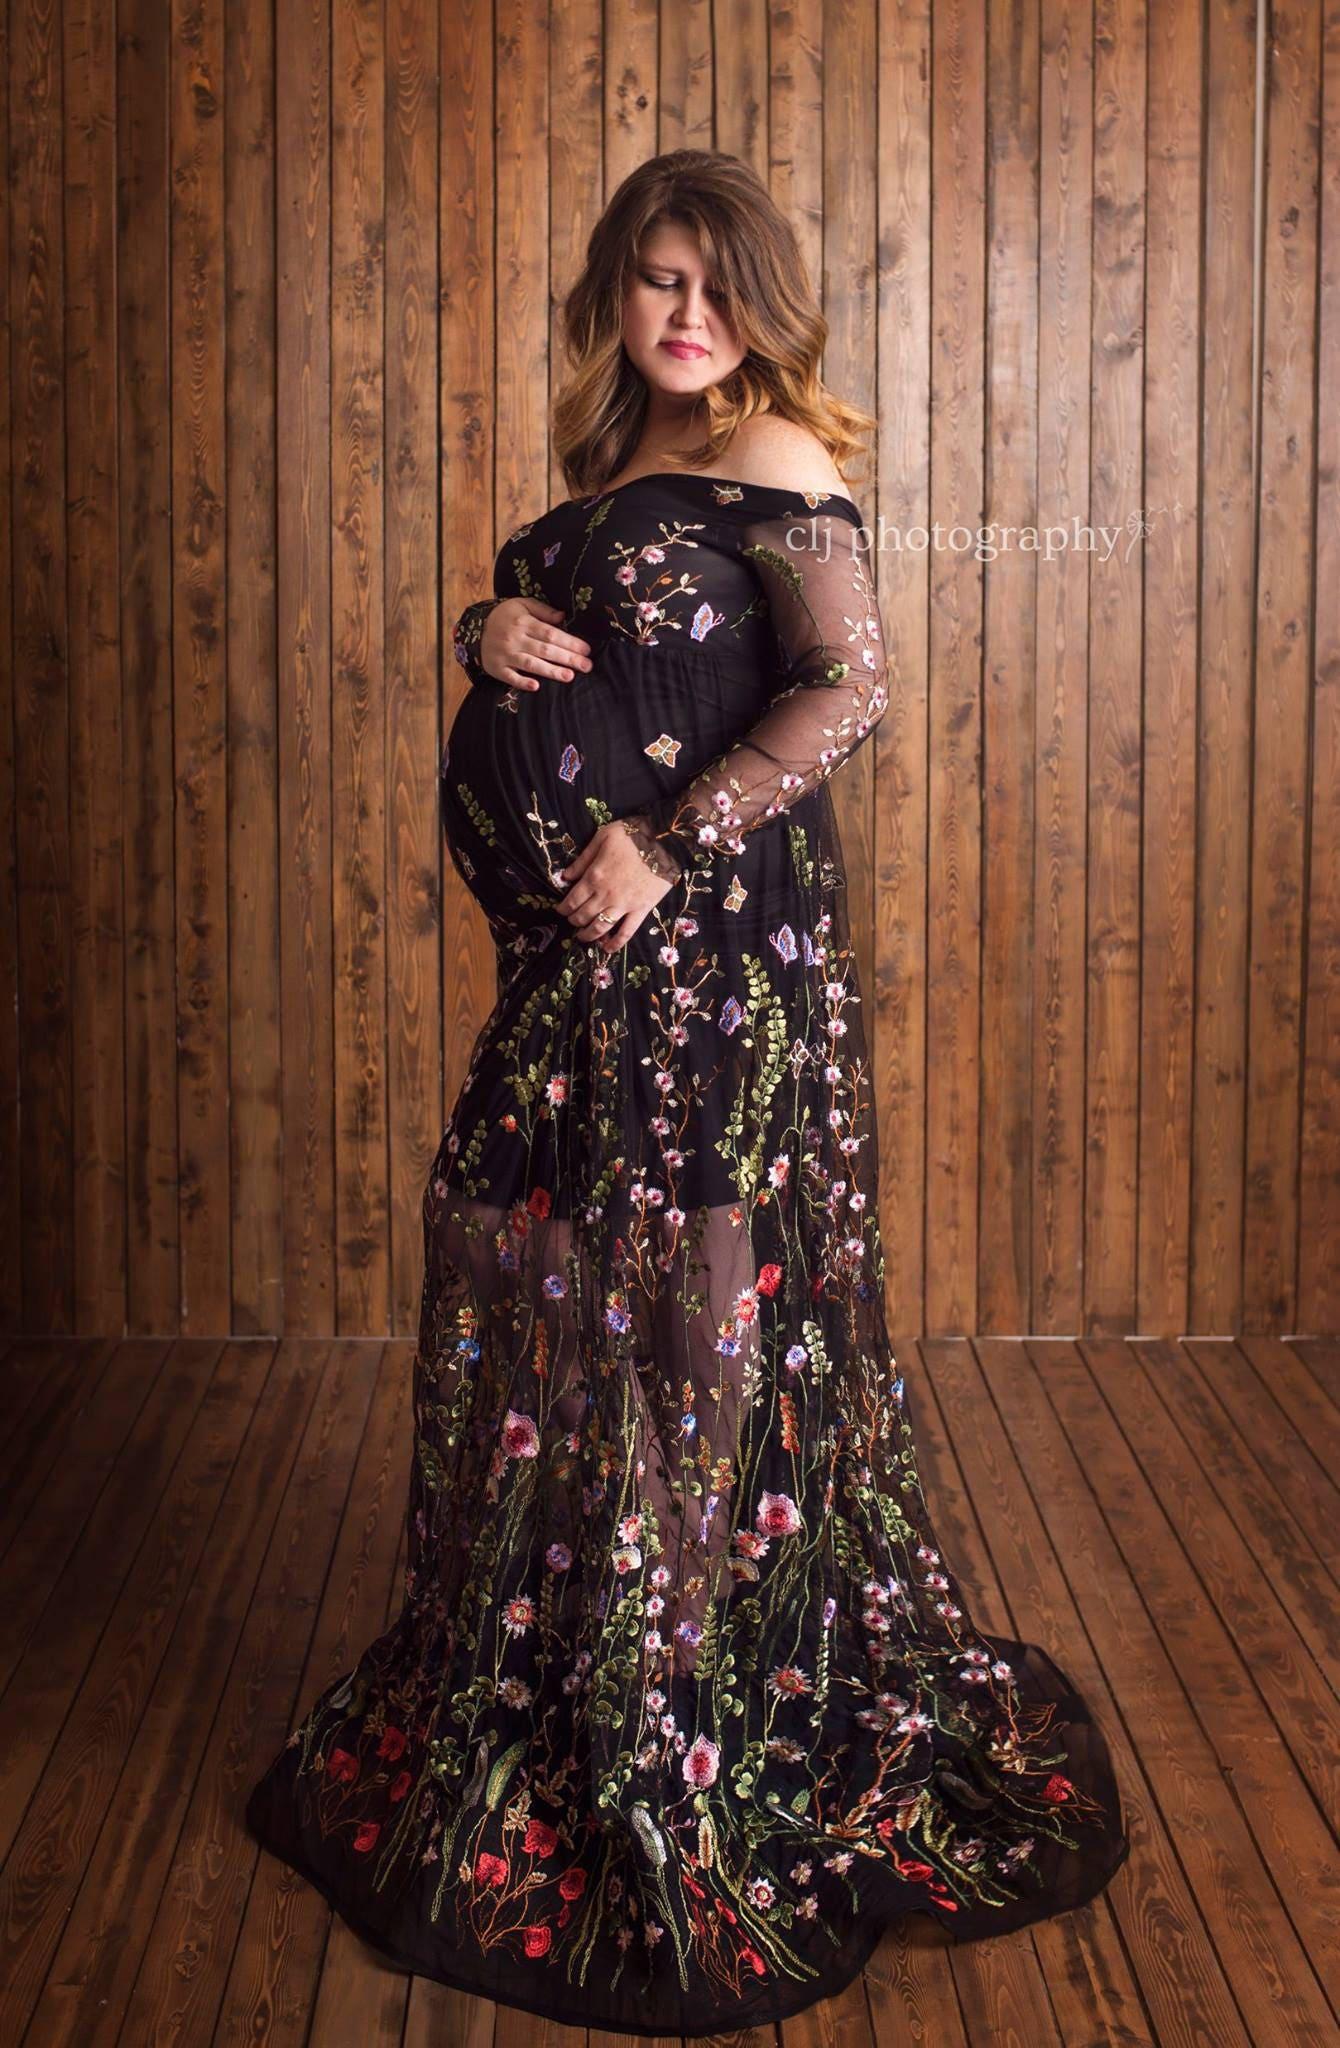 The Renata Maternity Gown Pregnancy Dress | Etsy